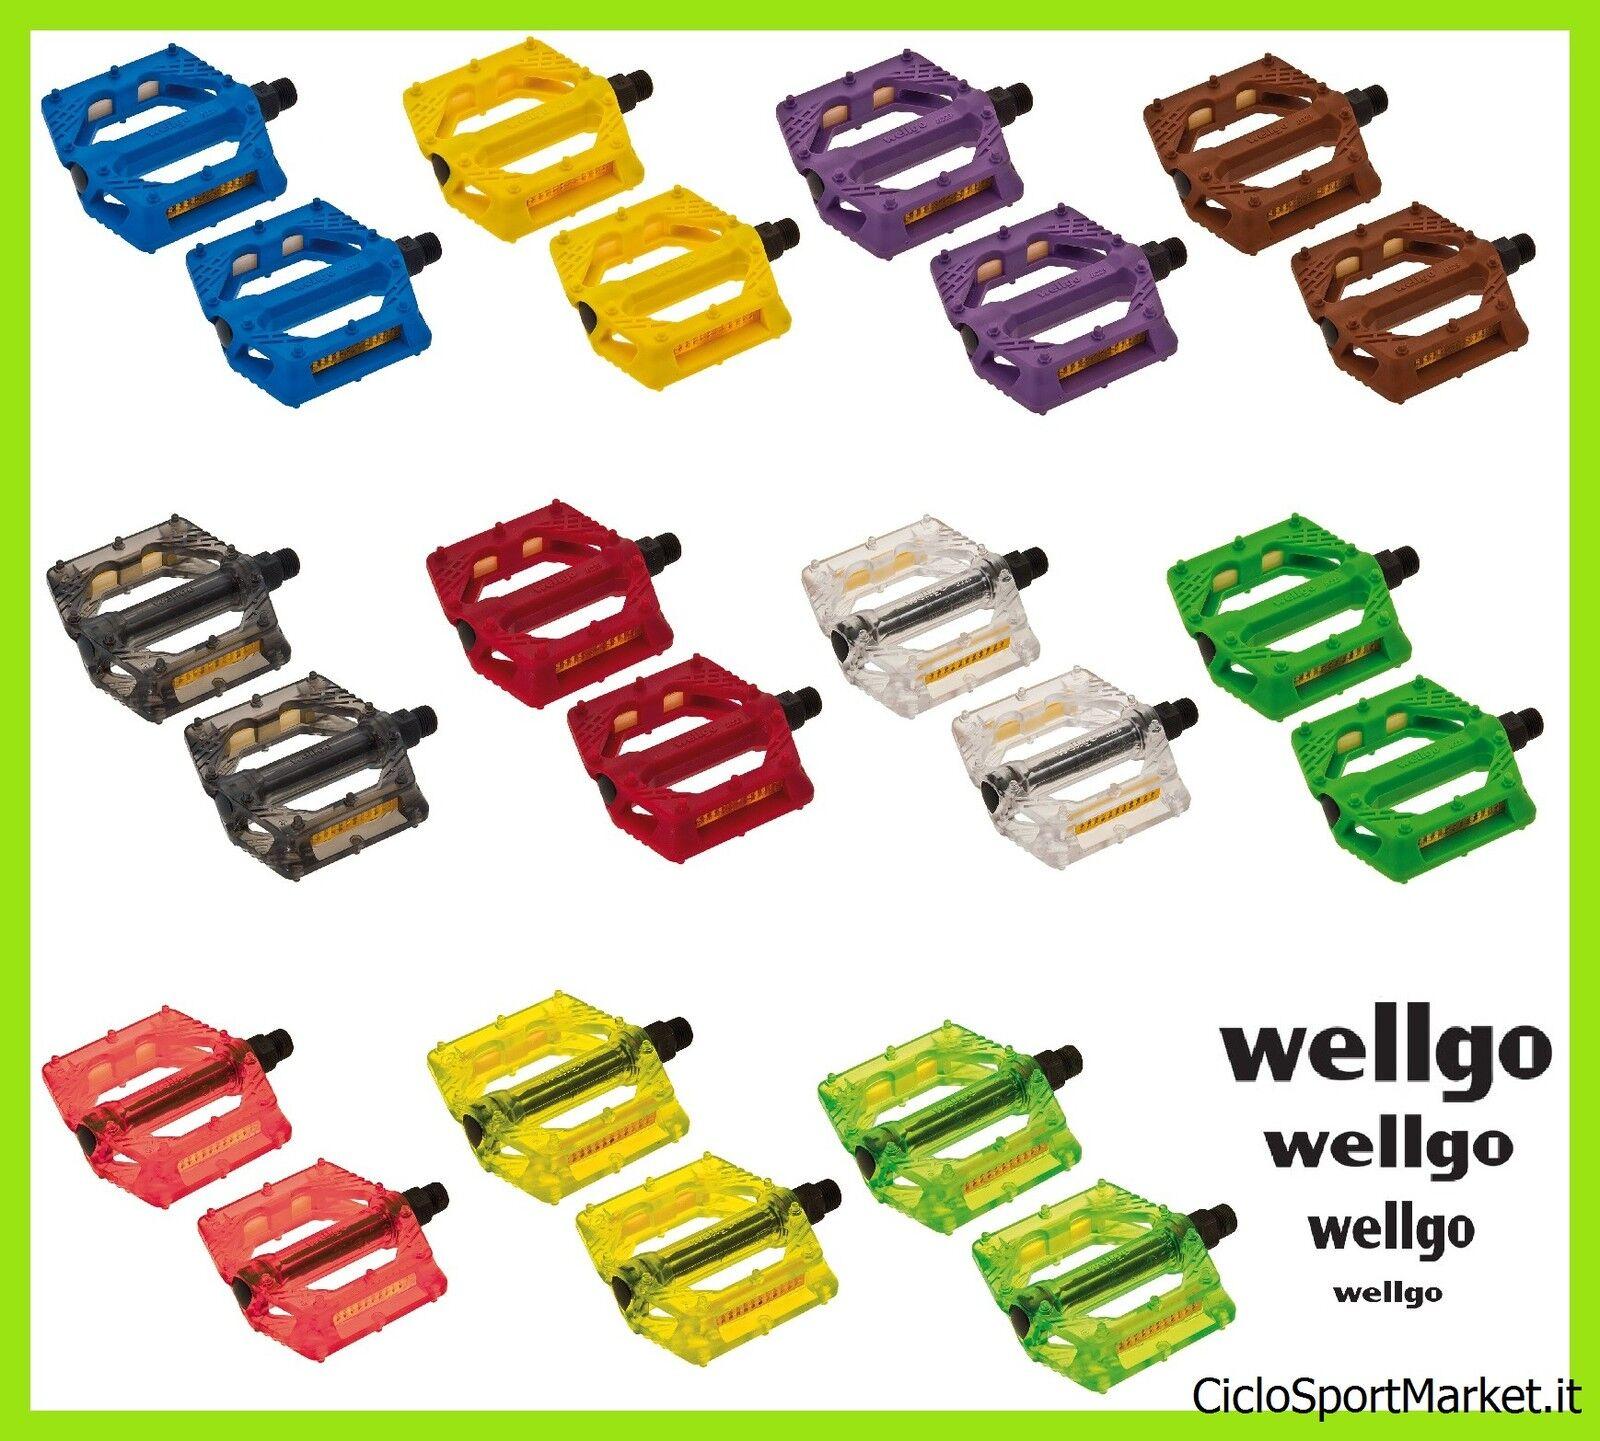 Pedale Harz Kunststoff WellGo für Fahrrad starrer Gang/BMX/MTB - Alle Farben